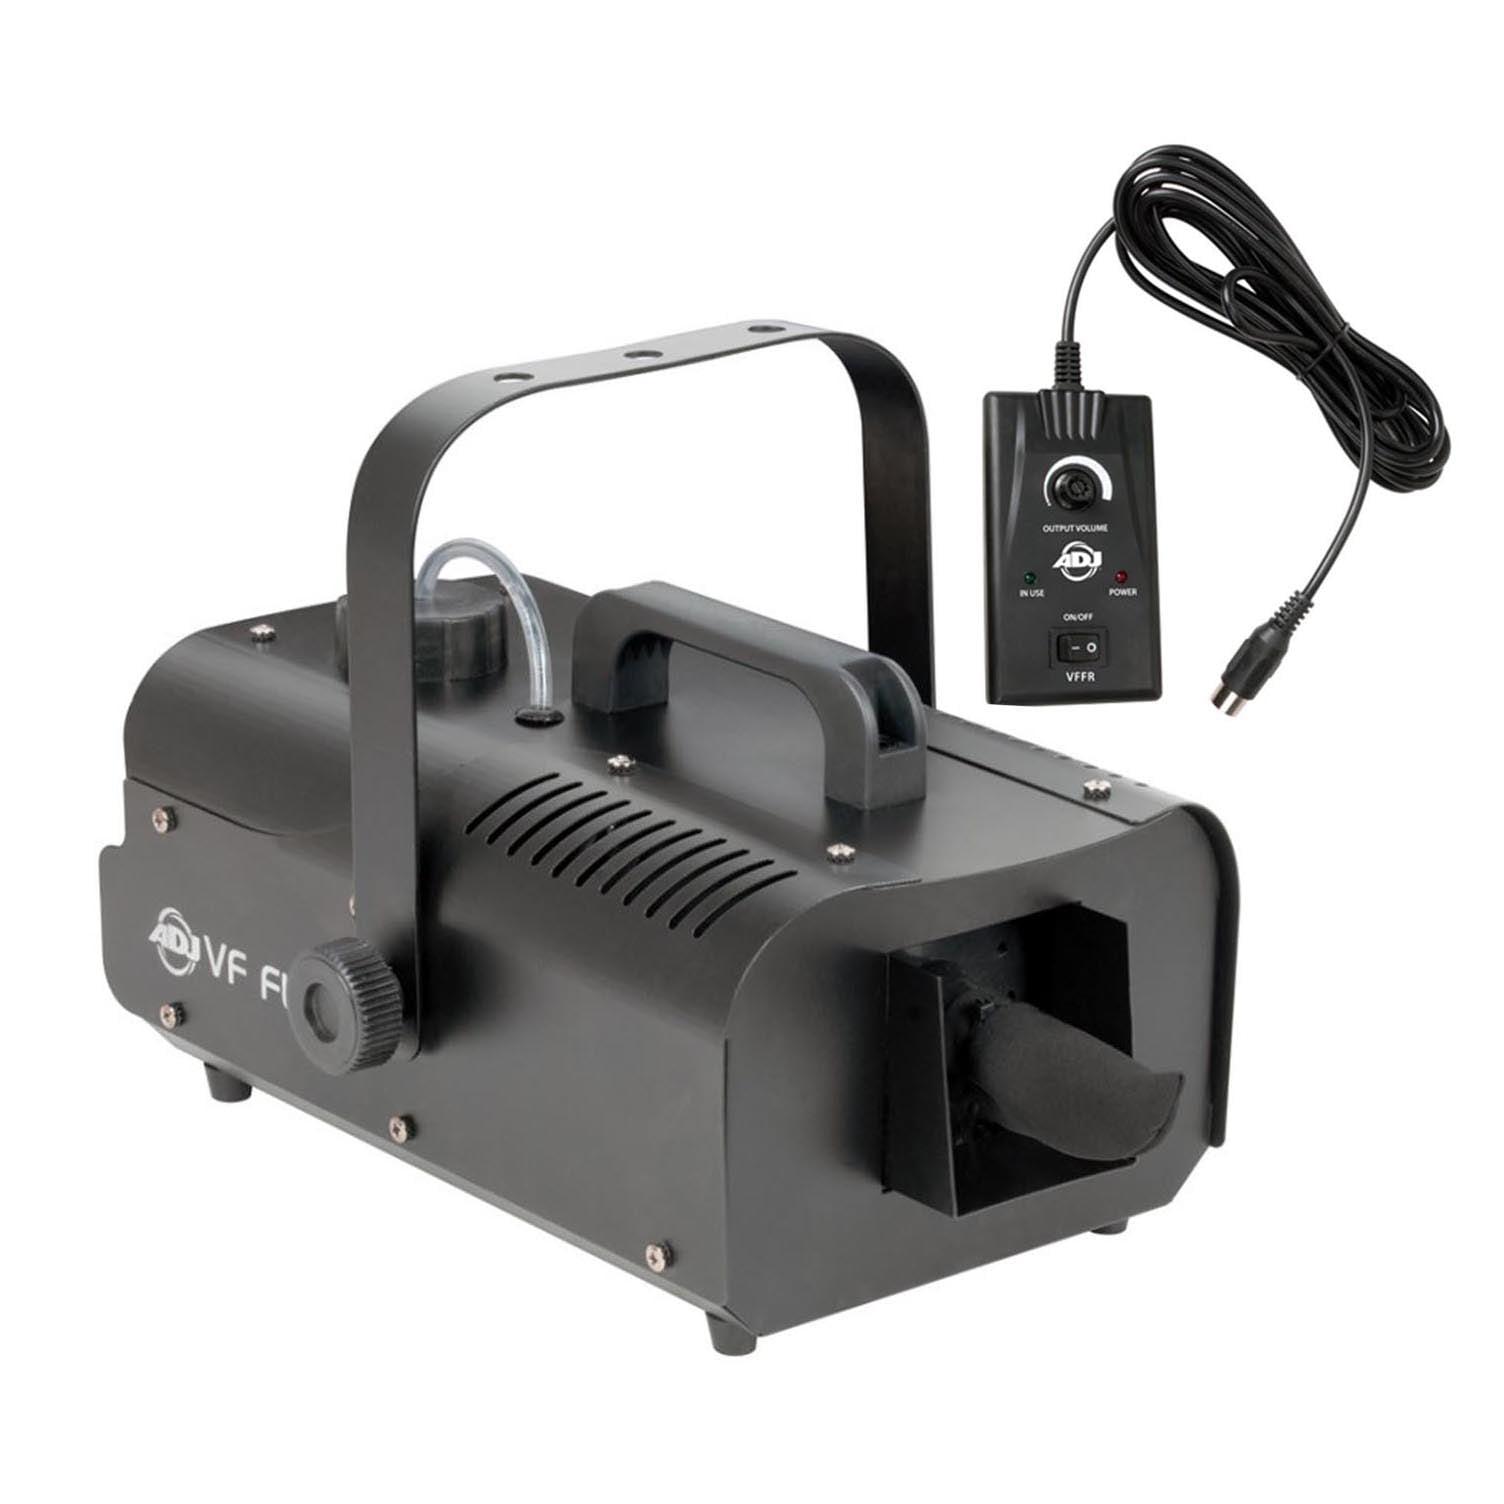 American DJ VF Flurry Snow Machine 600W High Output Area Effect w/ Wired Remote